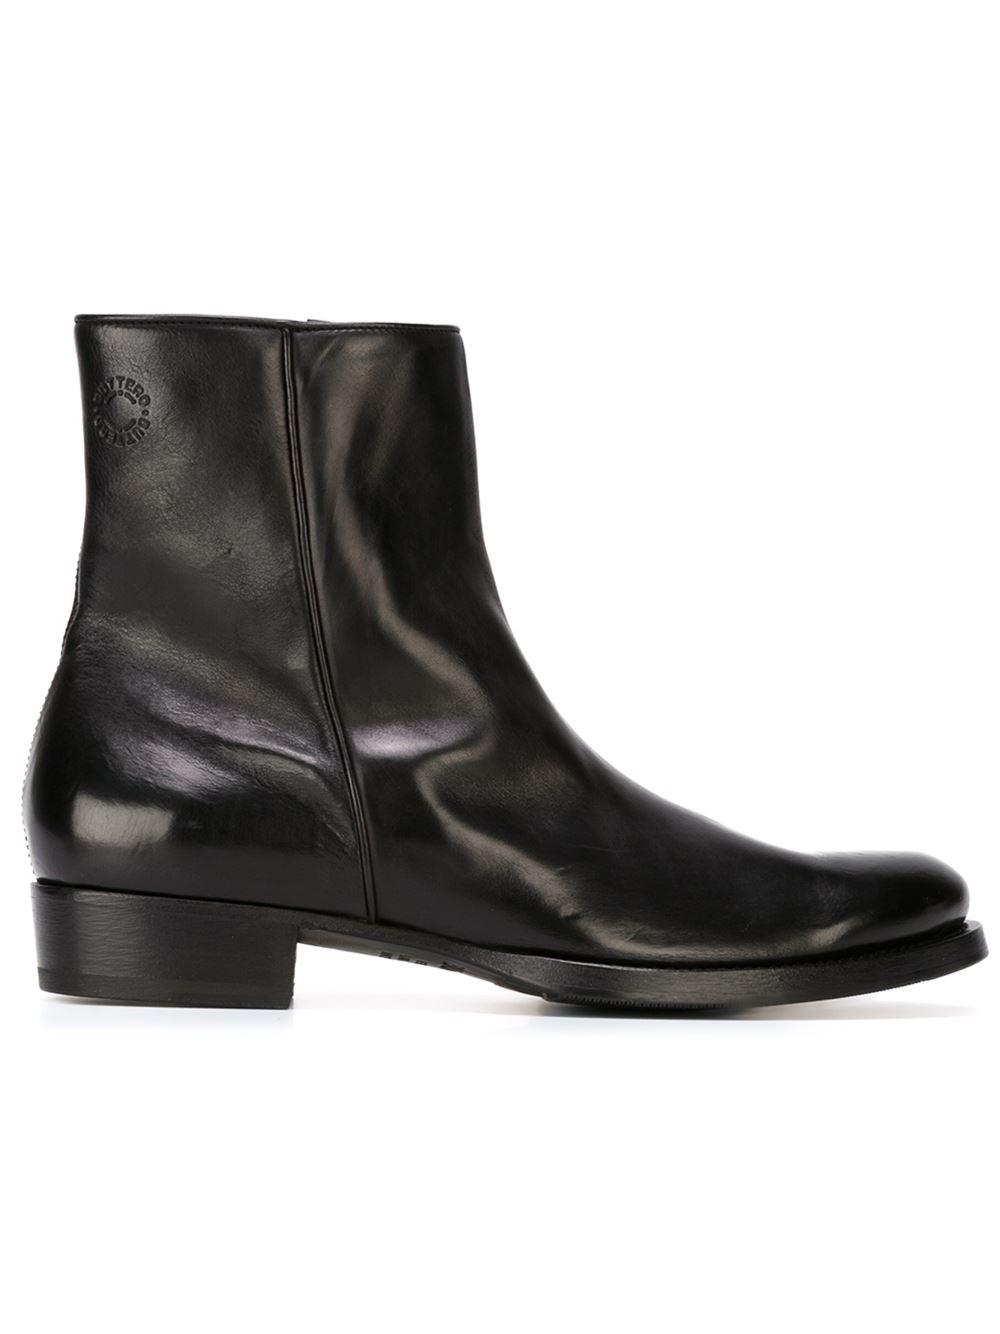 Buttero Side Zip Ankle Boots In Black For Men Lyst